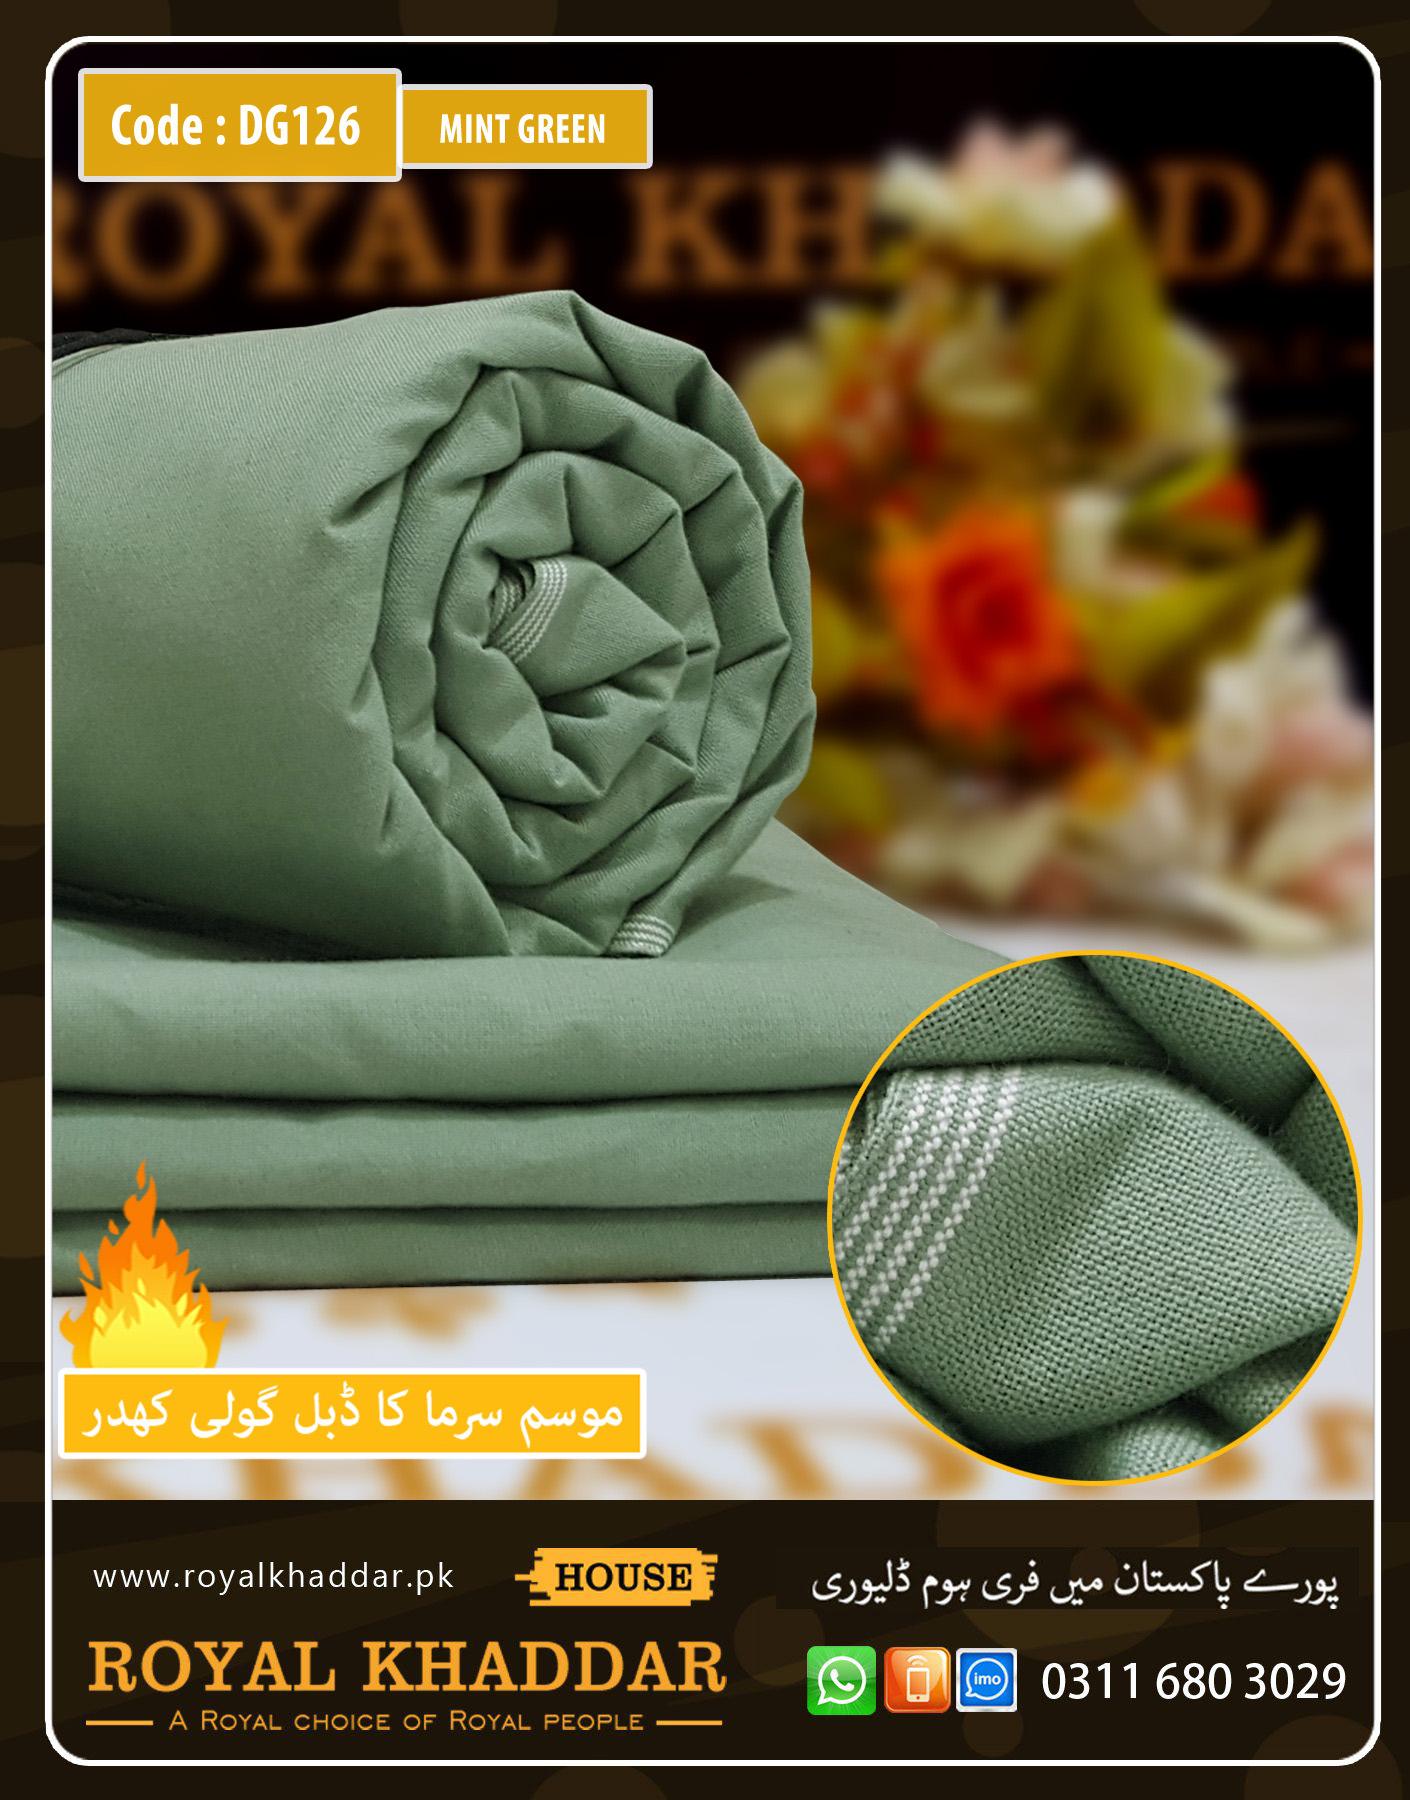 DG126 Mint Green Double Goli Winter Khaddar